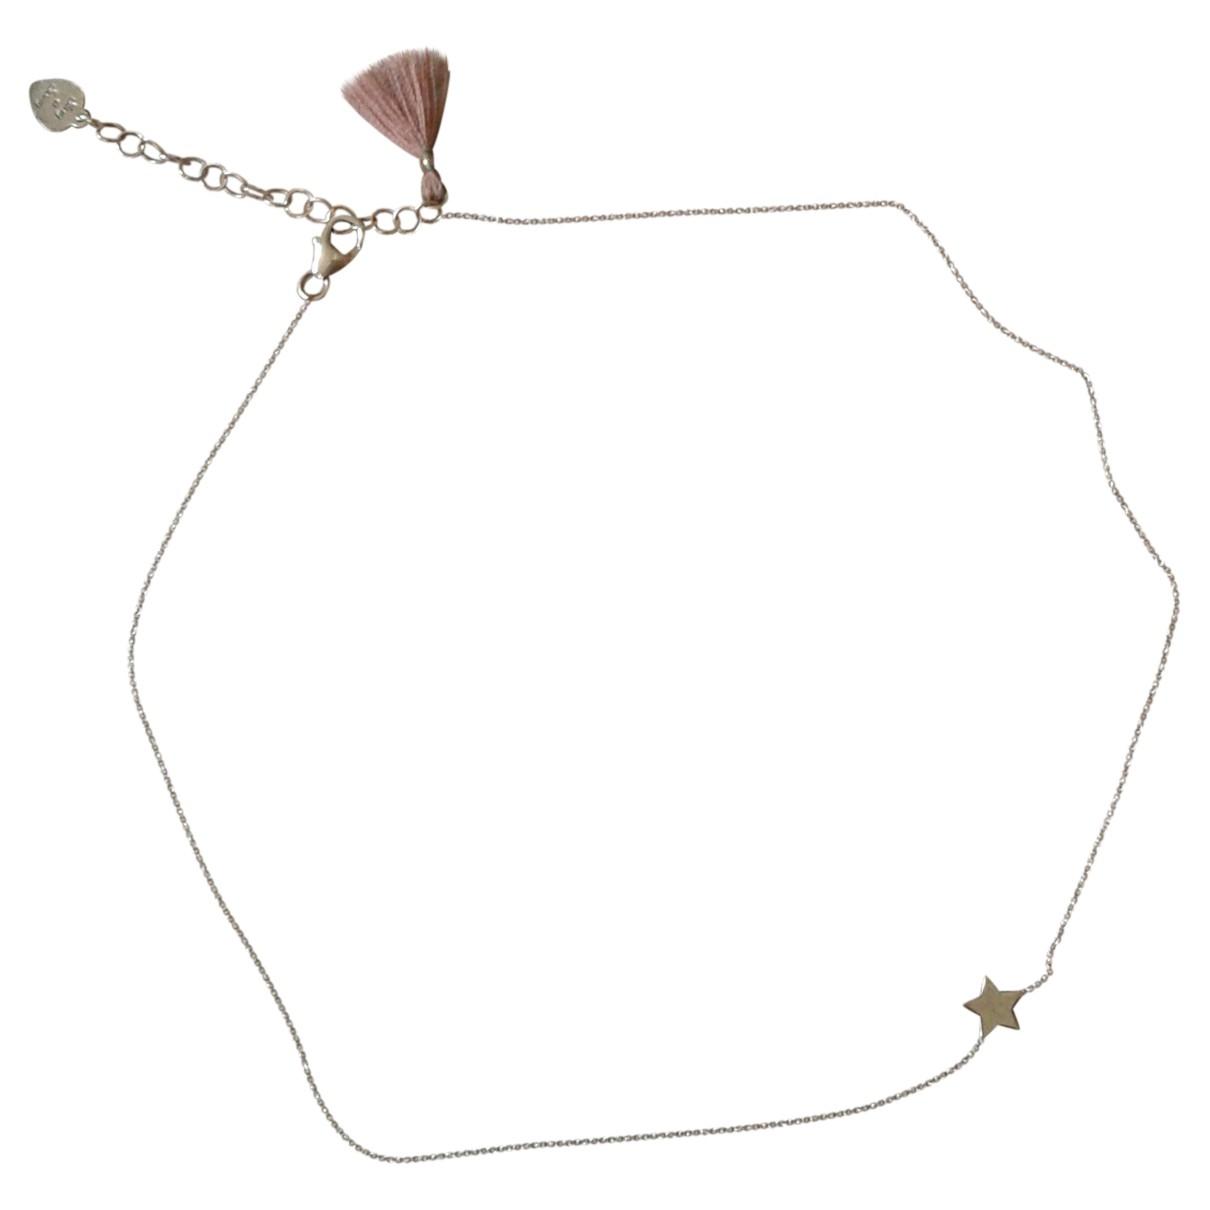 Collar Motifs Etoiles de Bermellon Non Signe / Unsigned